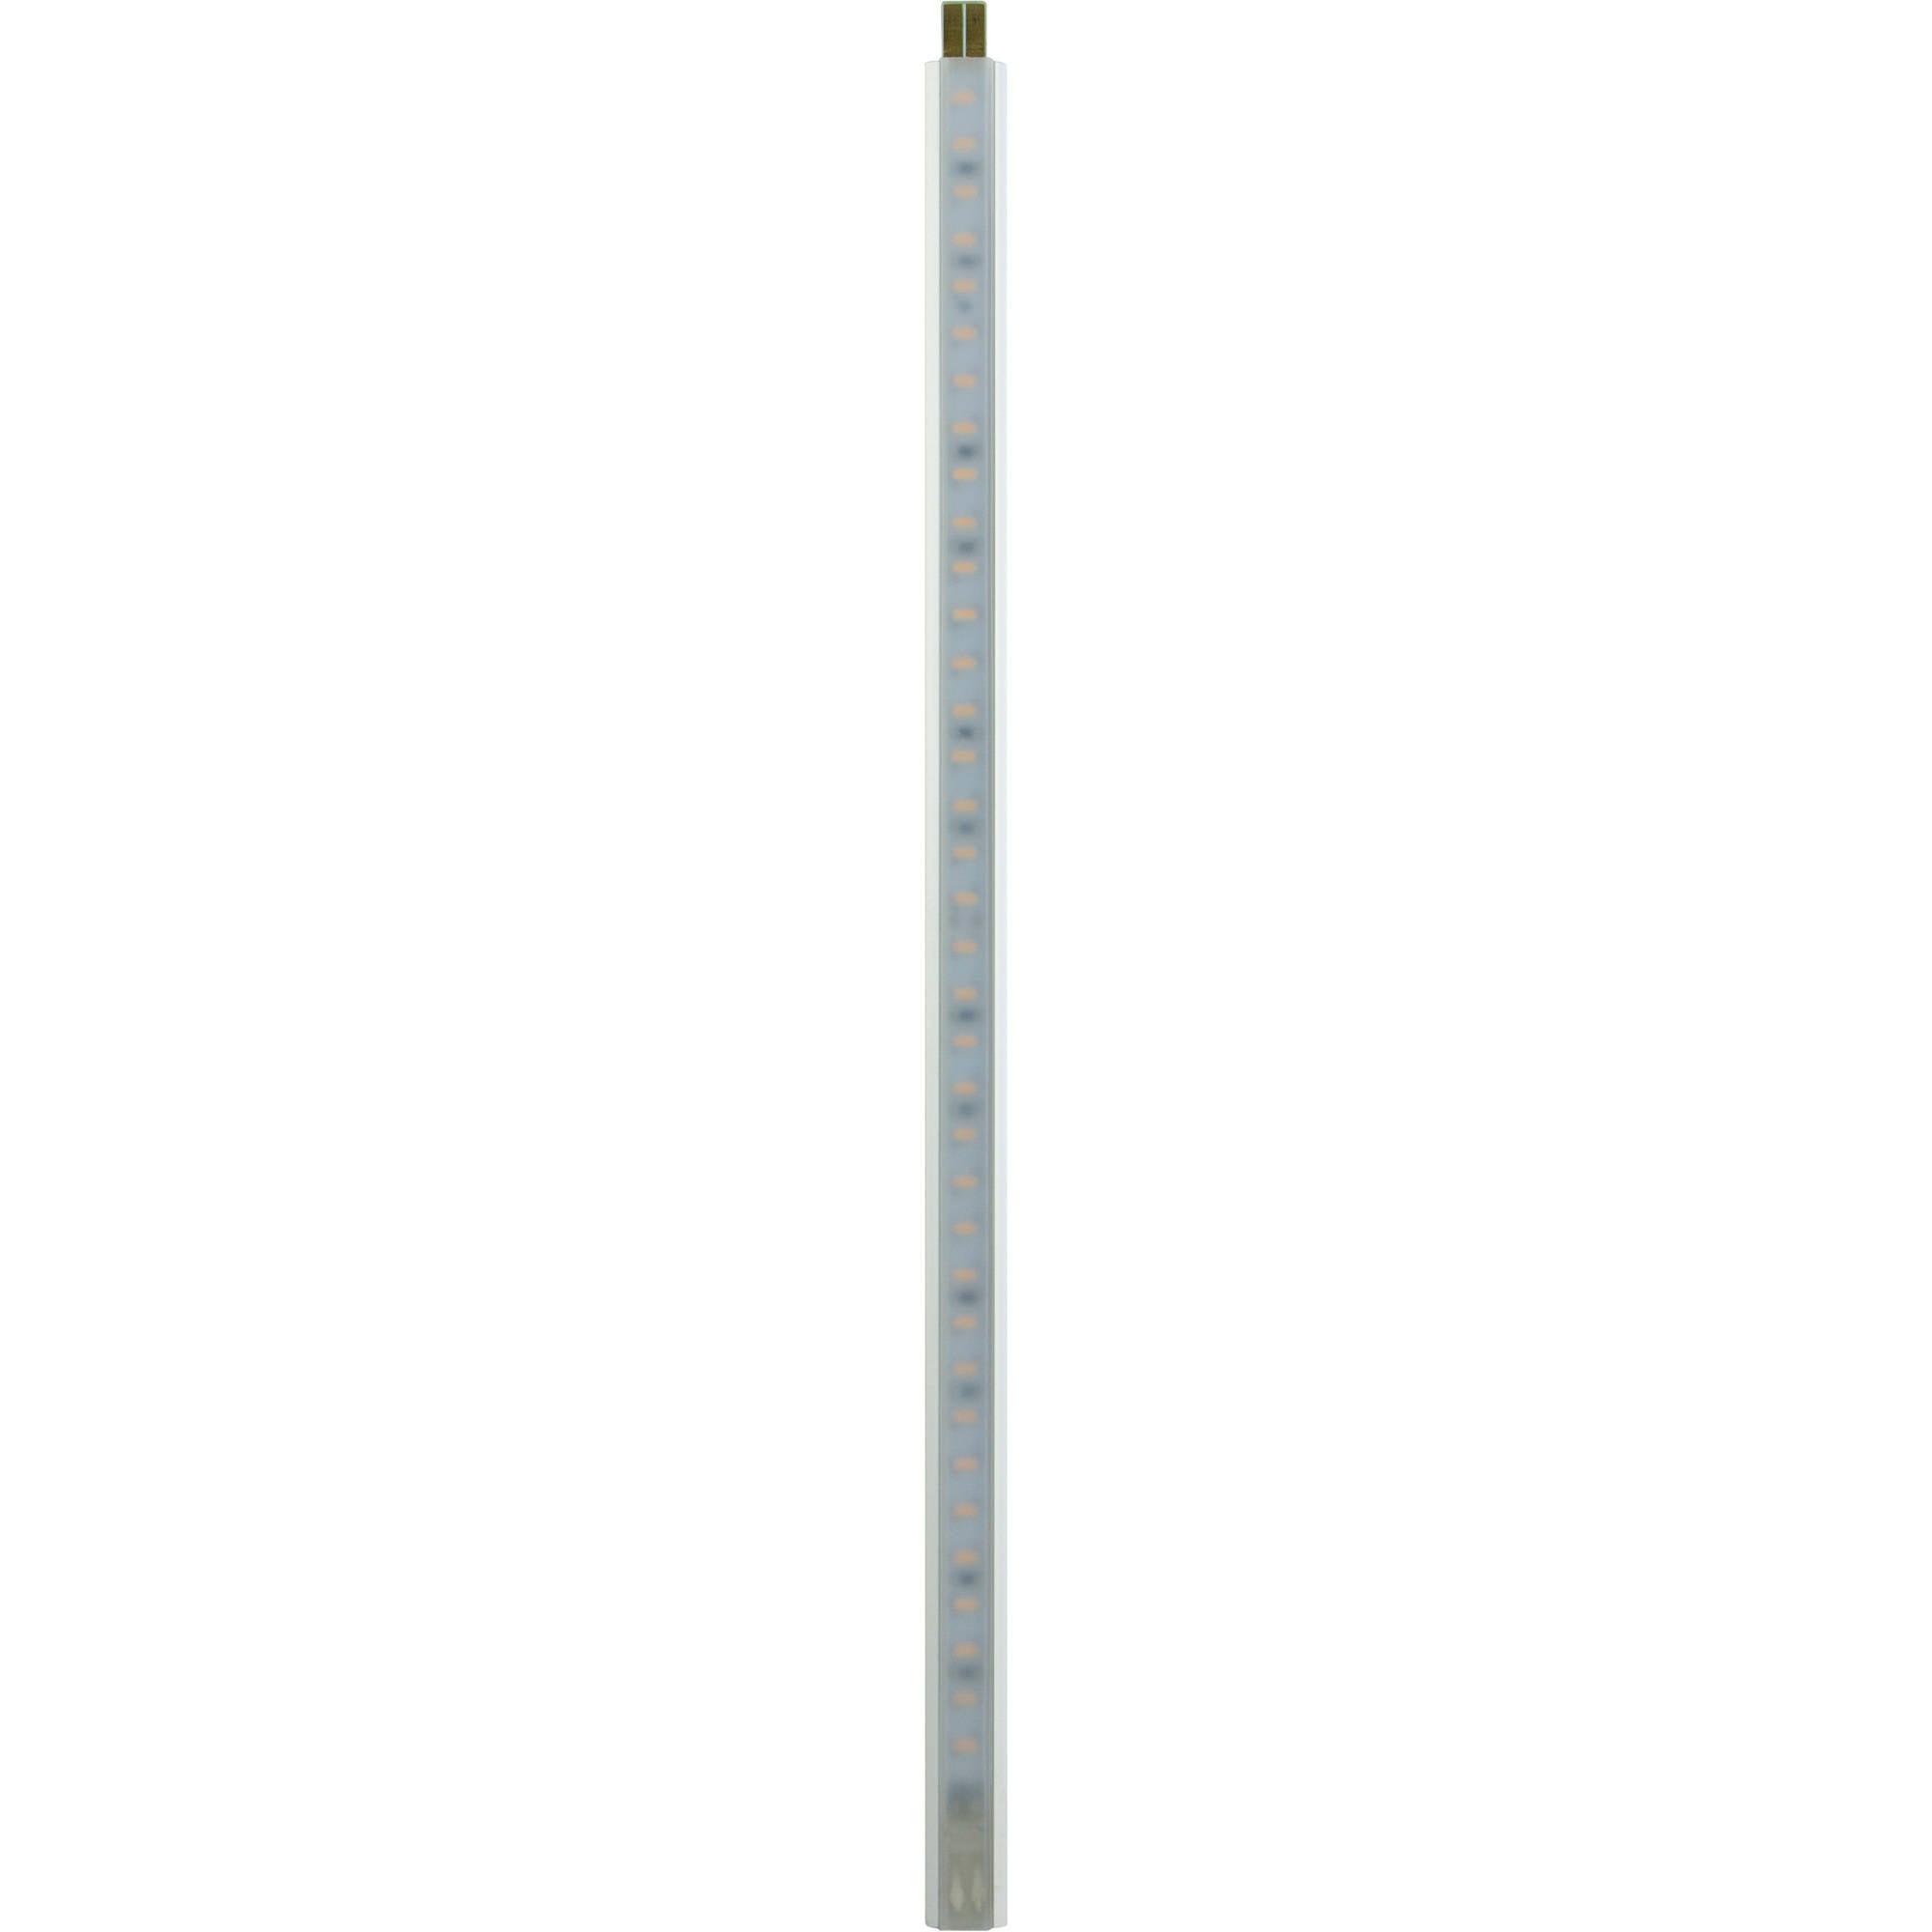 GE LED Bright Strip Under Cabinet Light Fixtures, 2pk - Walmart.com